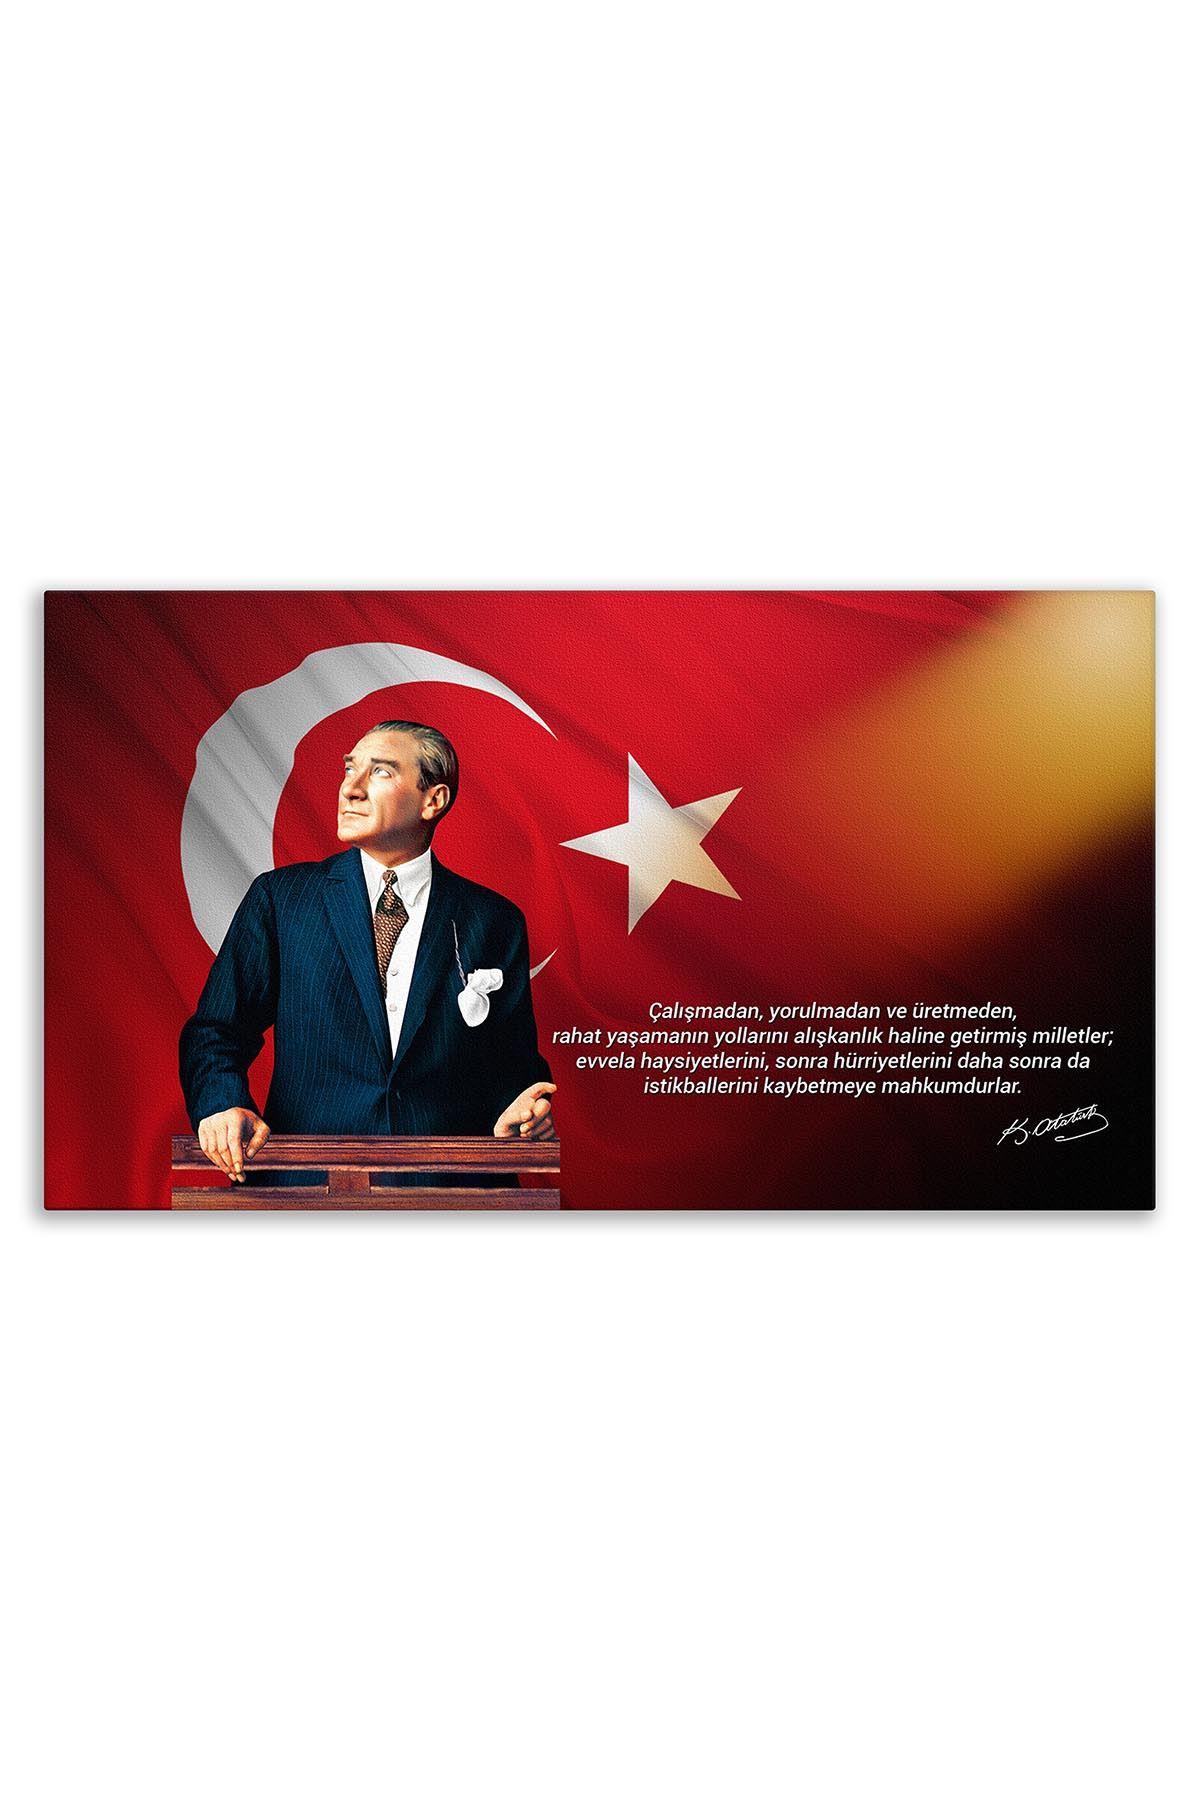 Atatürk Canvas Board With Turkish Flag | Printed Canvas Board | Customized Board